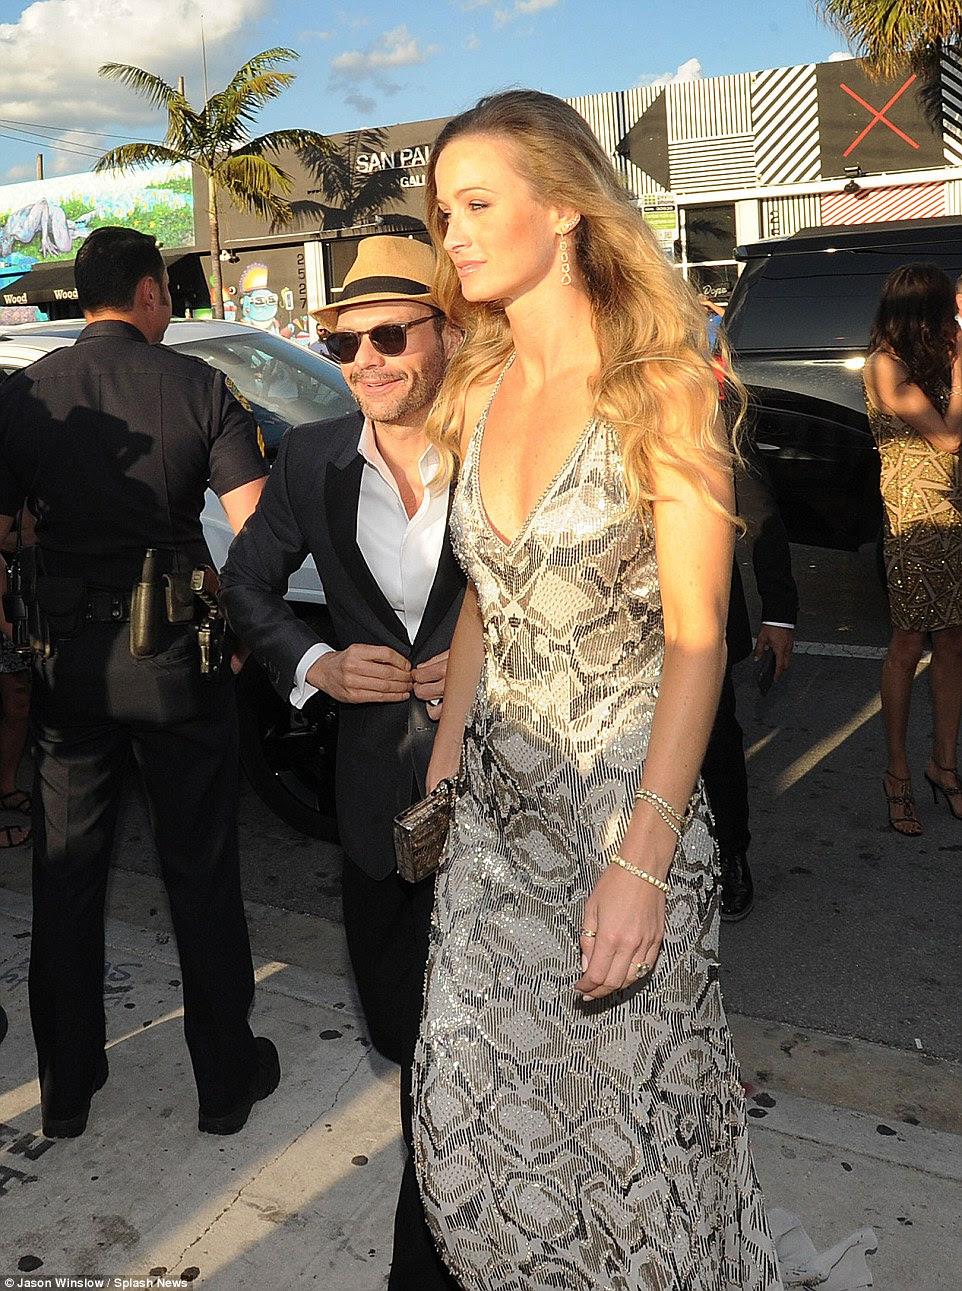 American Idol presenter Ryan's girlfriend Hilary towered over the diminutive presenter